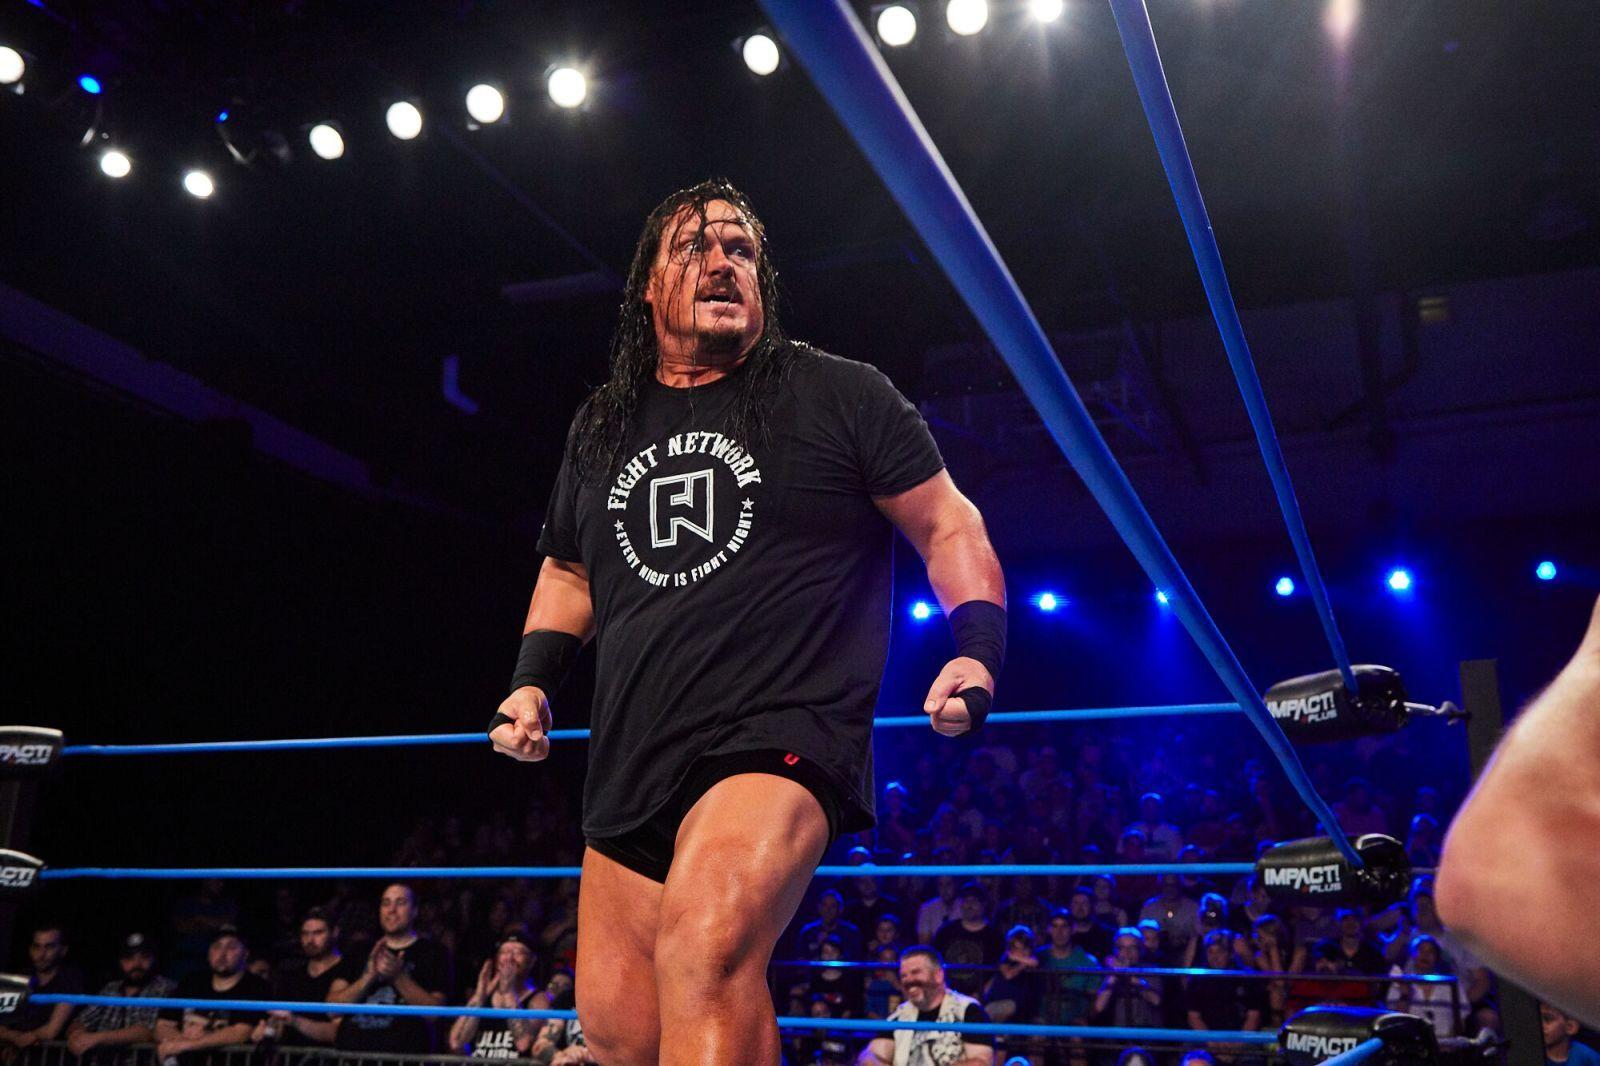 Rhino talks his return to Impact Wrestling, going to Saudi Arabia in WWE, and more!